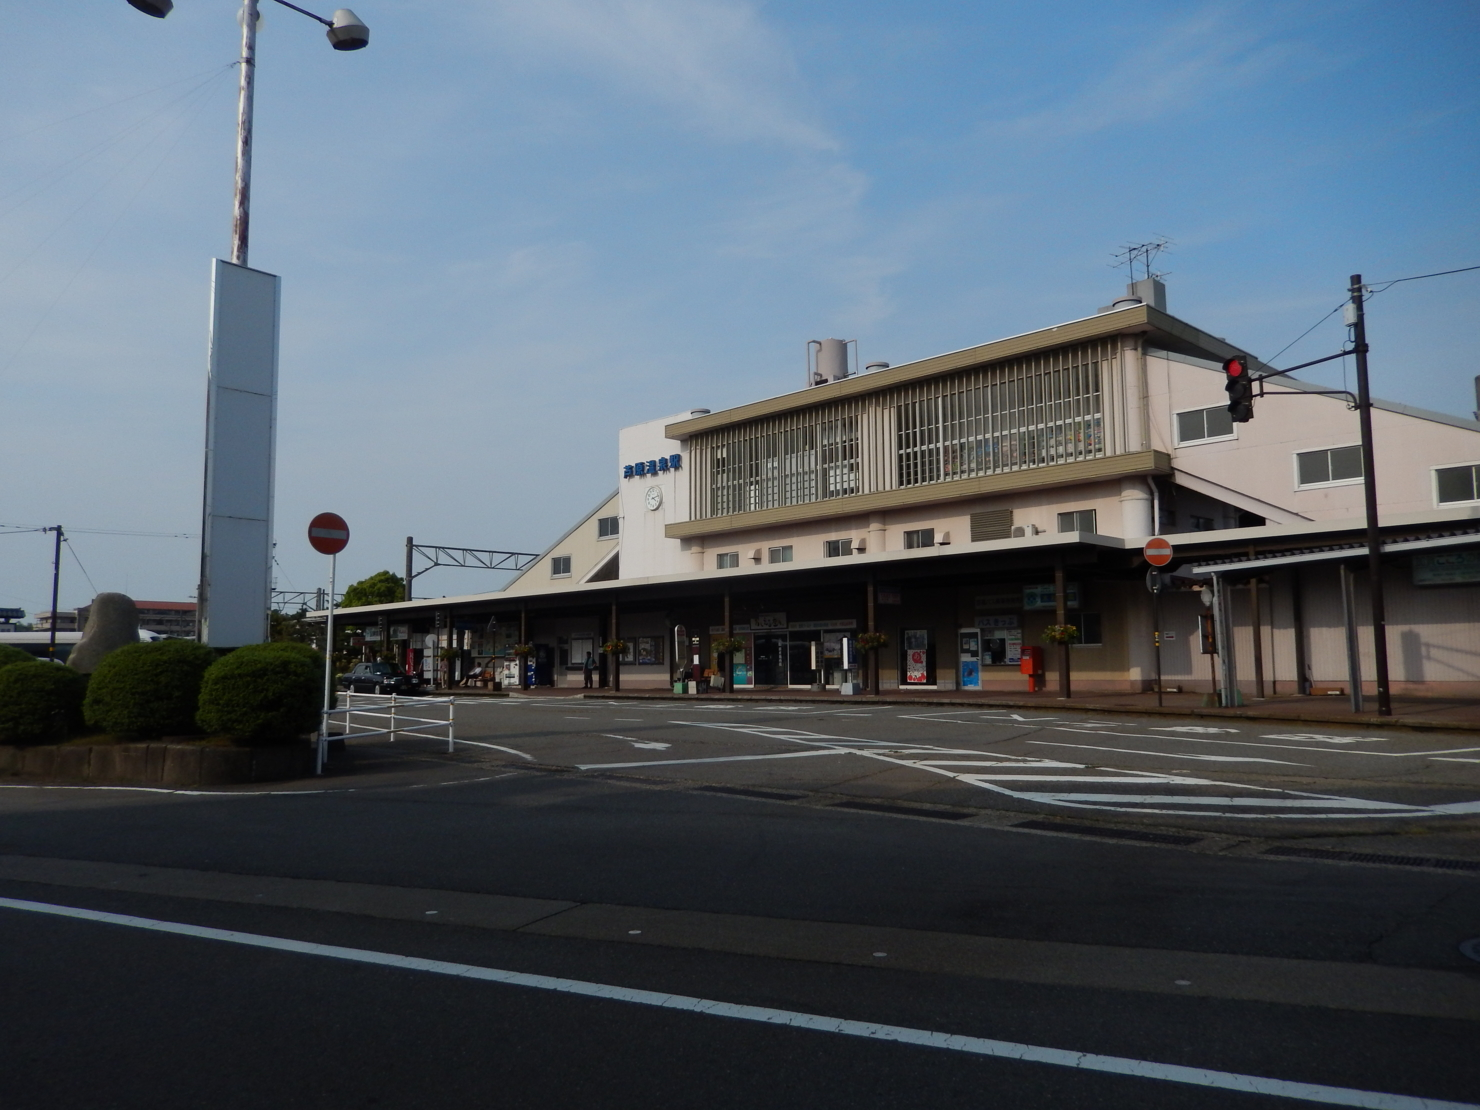 f:id:ToshUeno:20130524161440j:plain